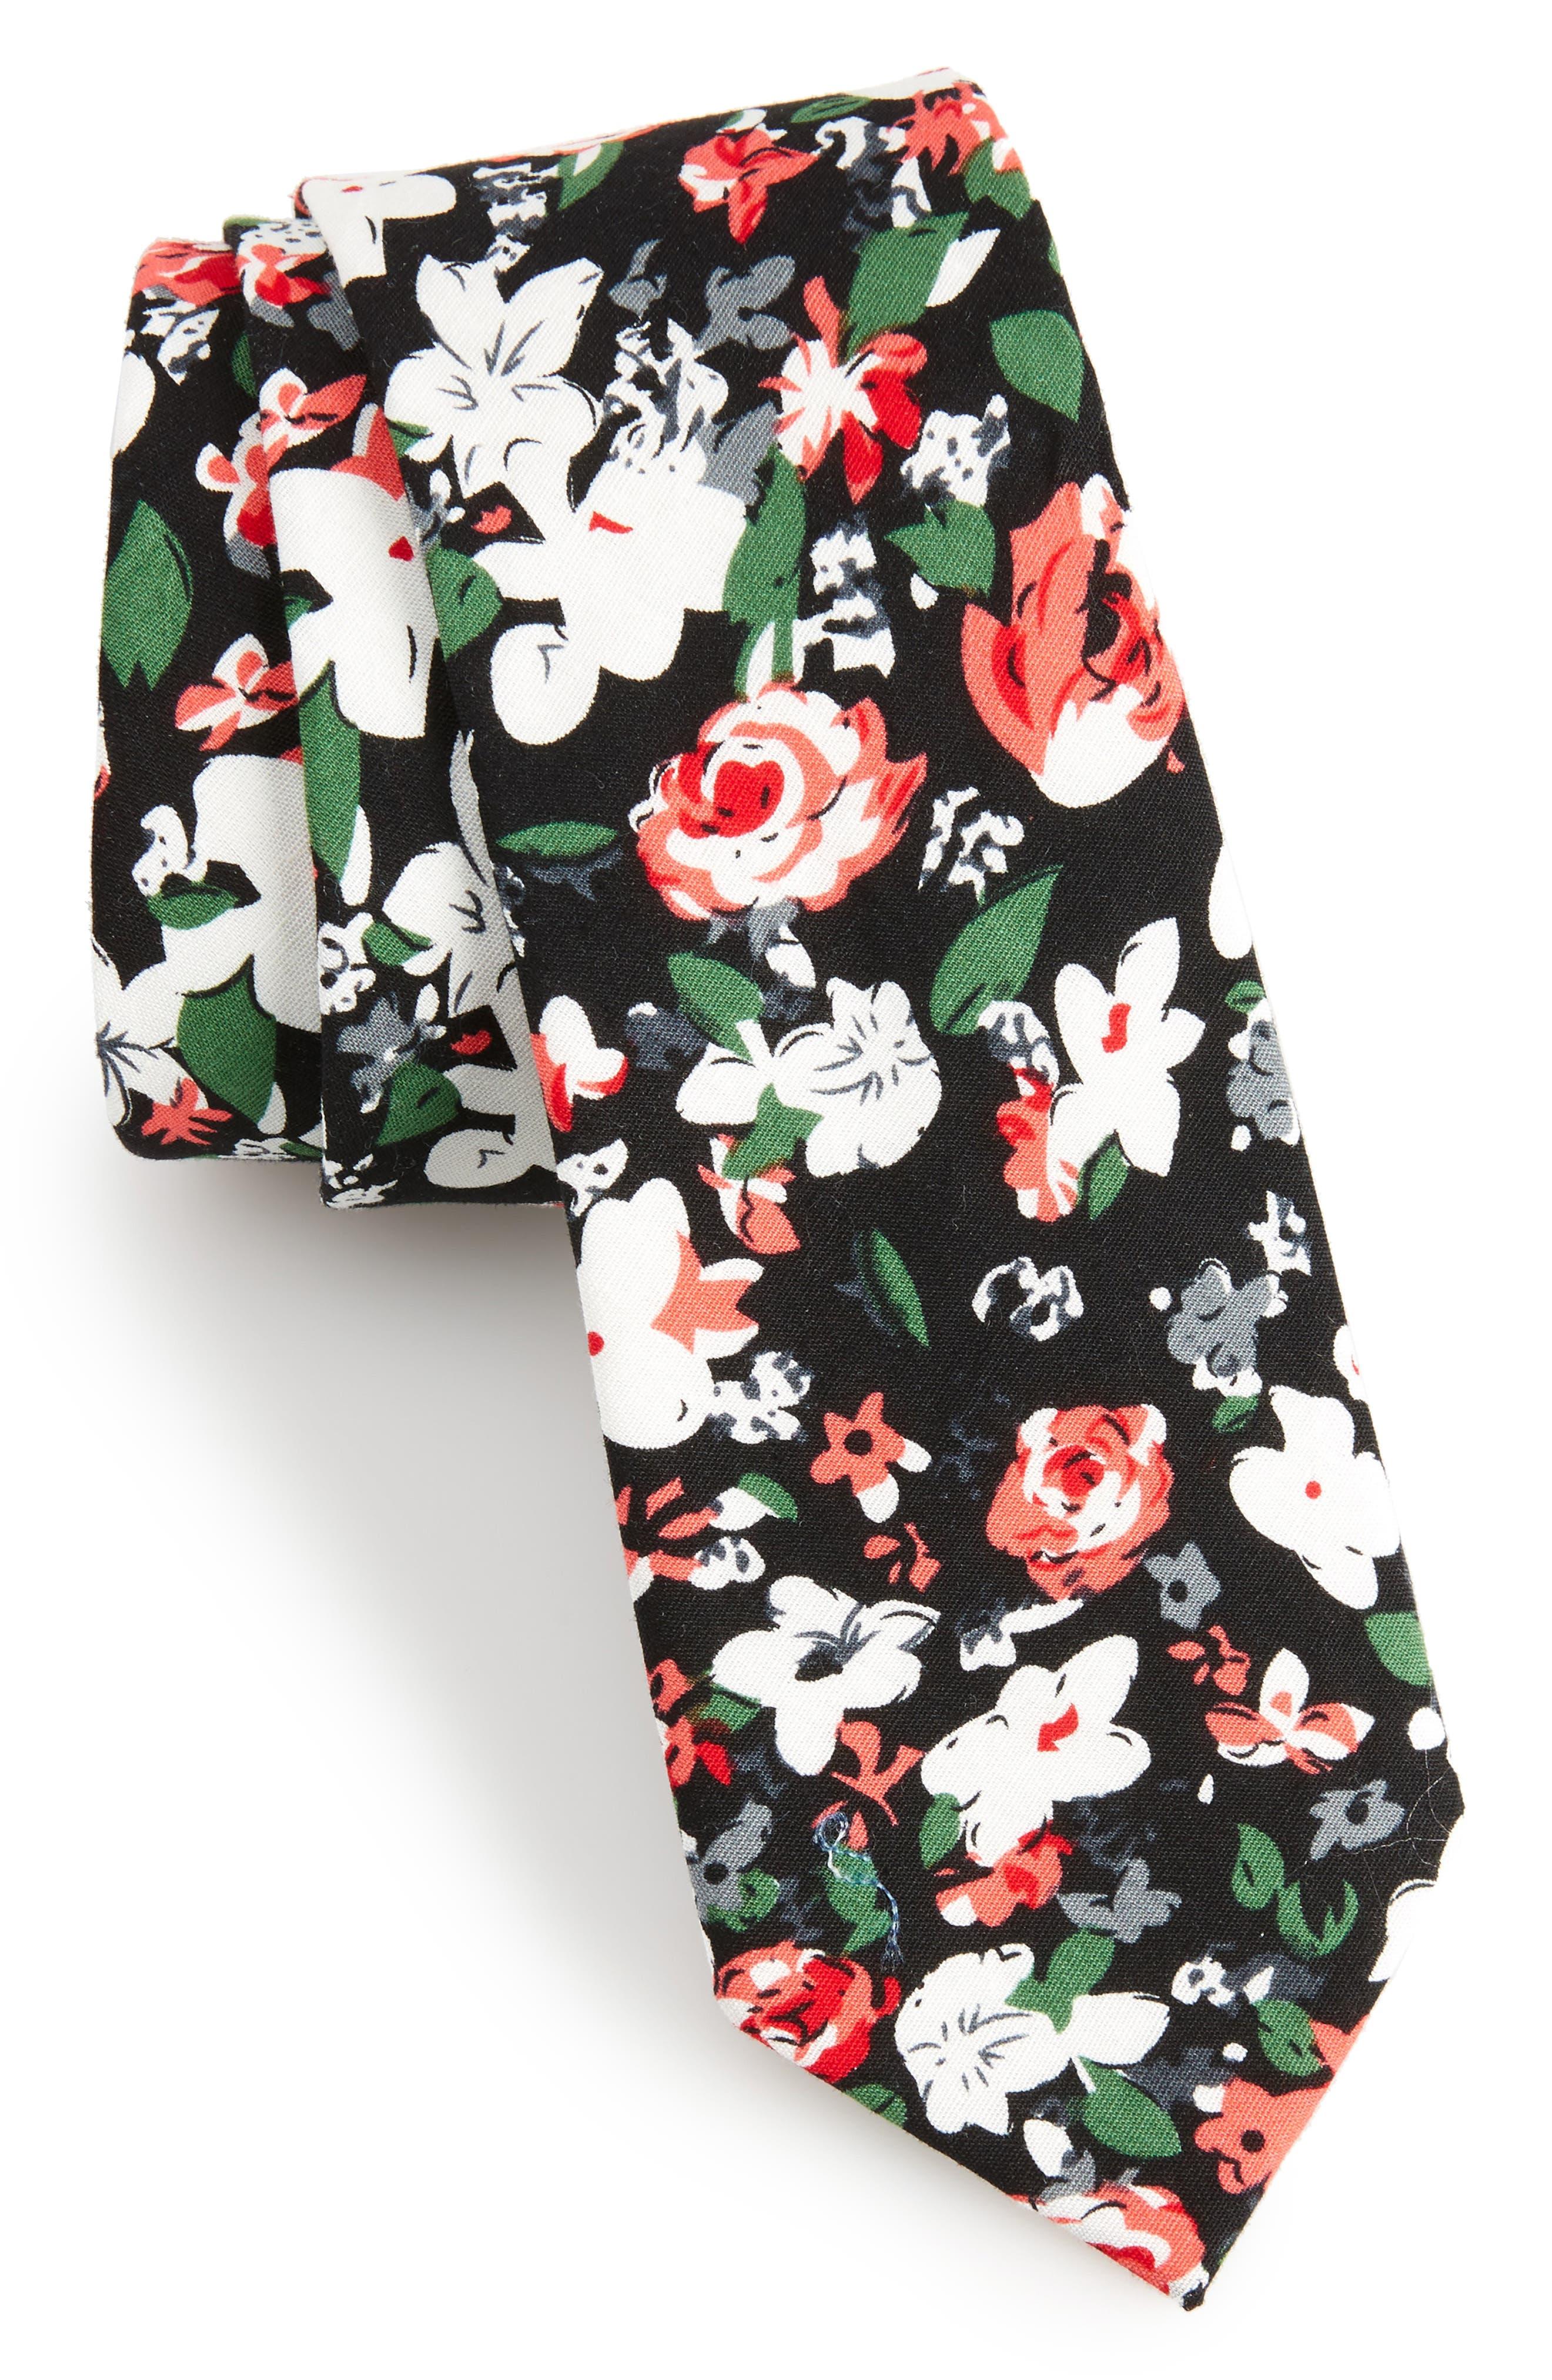 Oceana Floral Cotton Tie,                         Main,                         color, Black